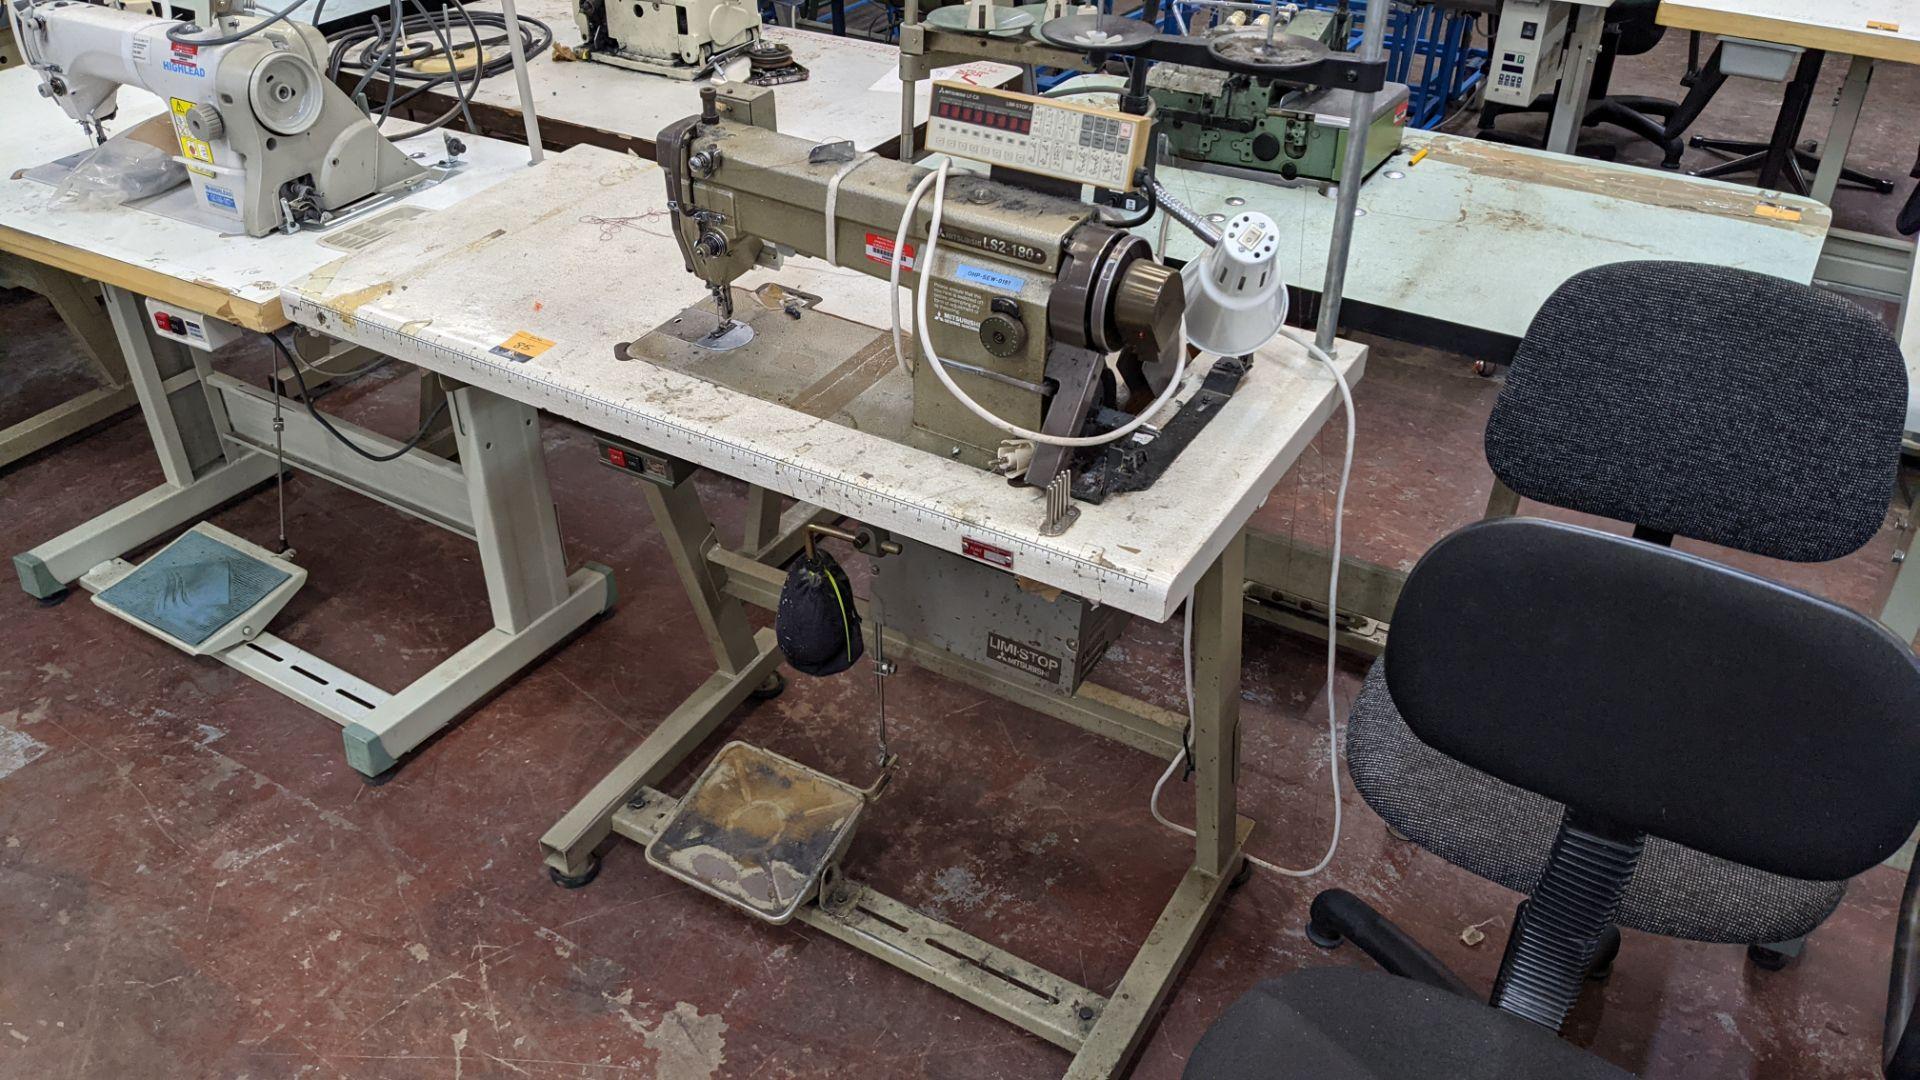 Mitsubishi LS2-180 sewing machine with Mitsubishi LF-C8 digital controller - Image 2 of 12